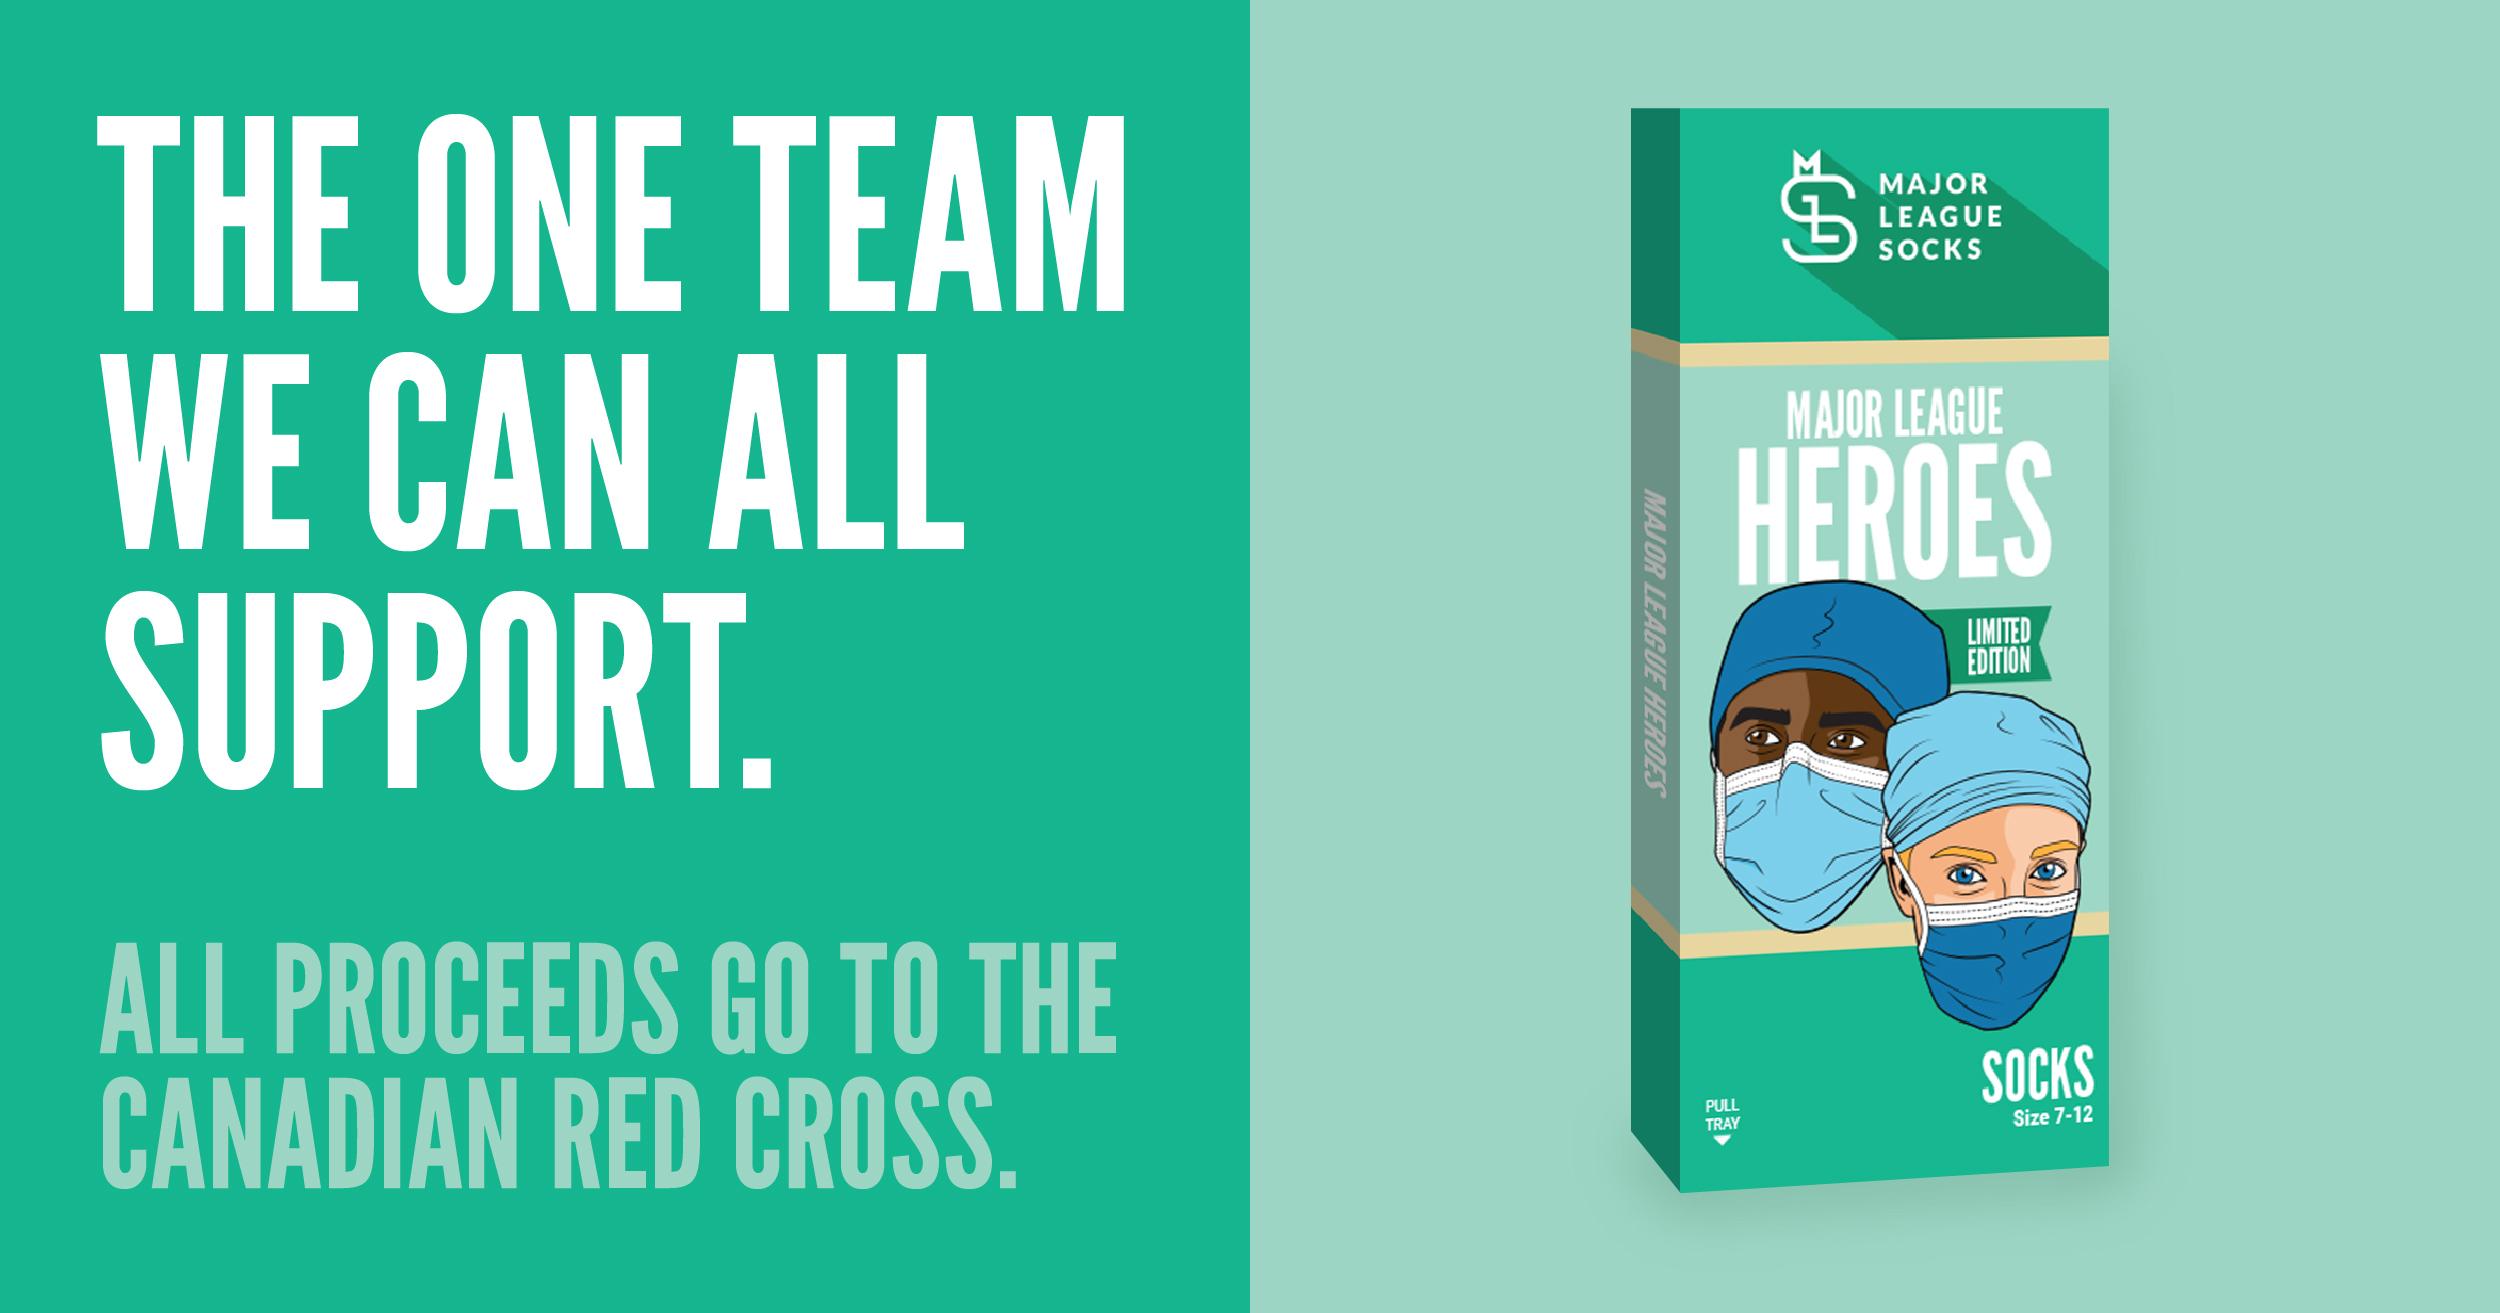 Major League Socks Introduces Limited-Edition Major League Heroes Product Line